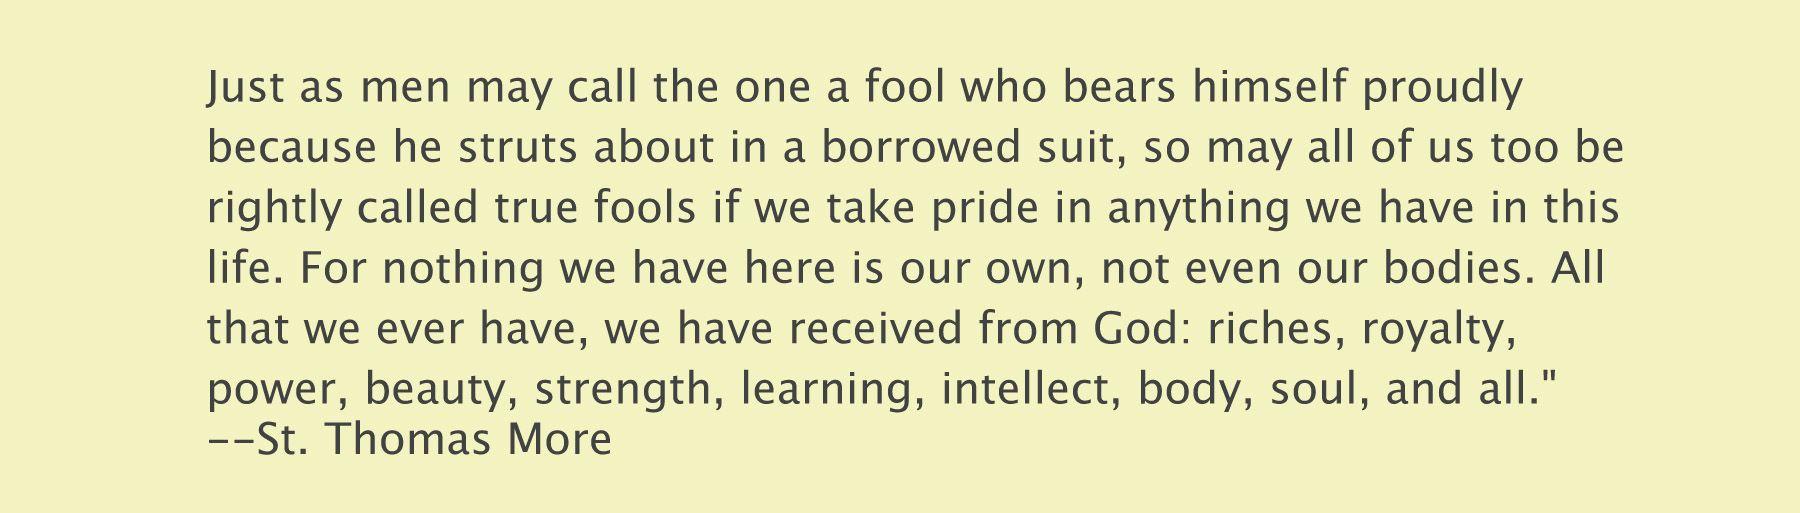 Saint Thomas More Quotes